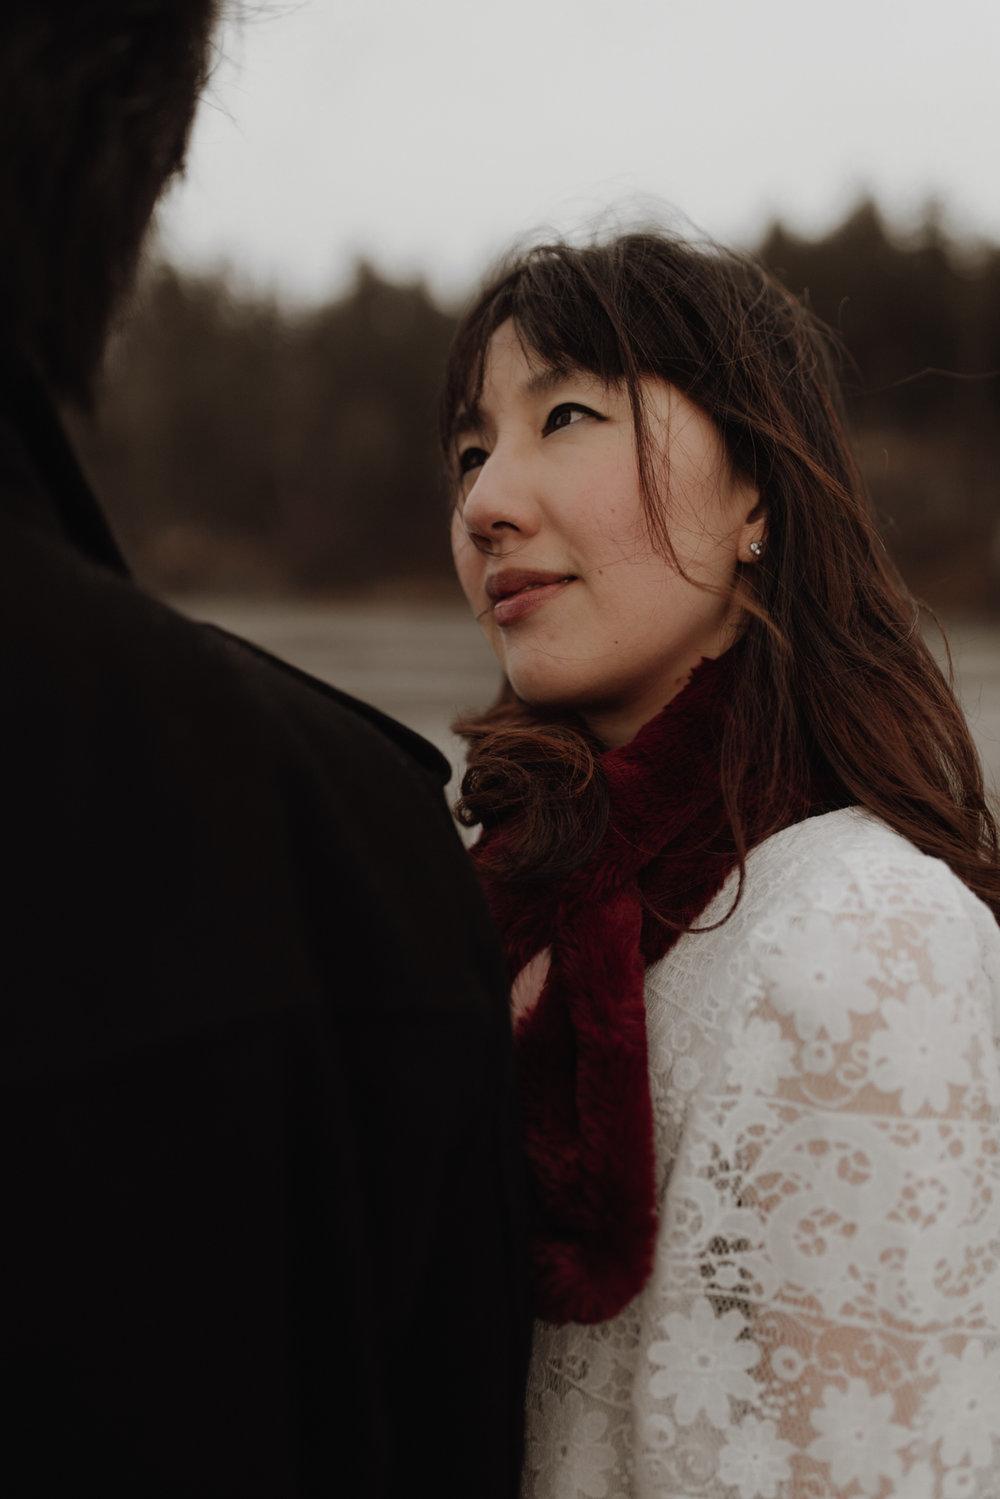 seattle-wedding-photographer-kerouac-0187.jpg